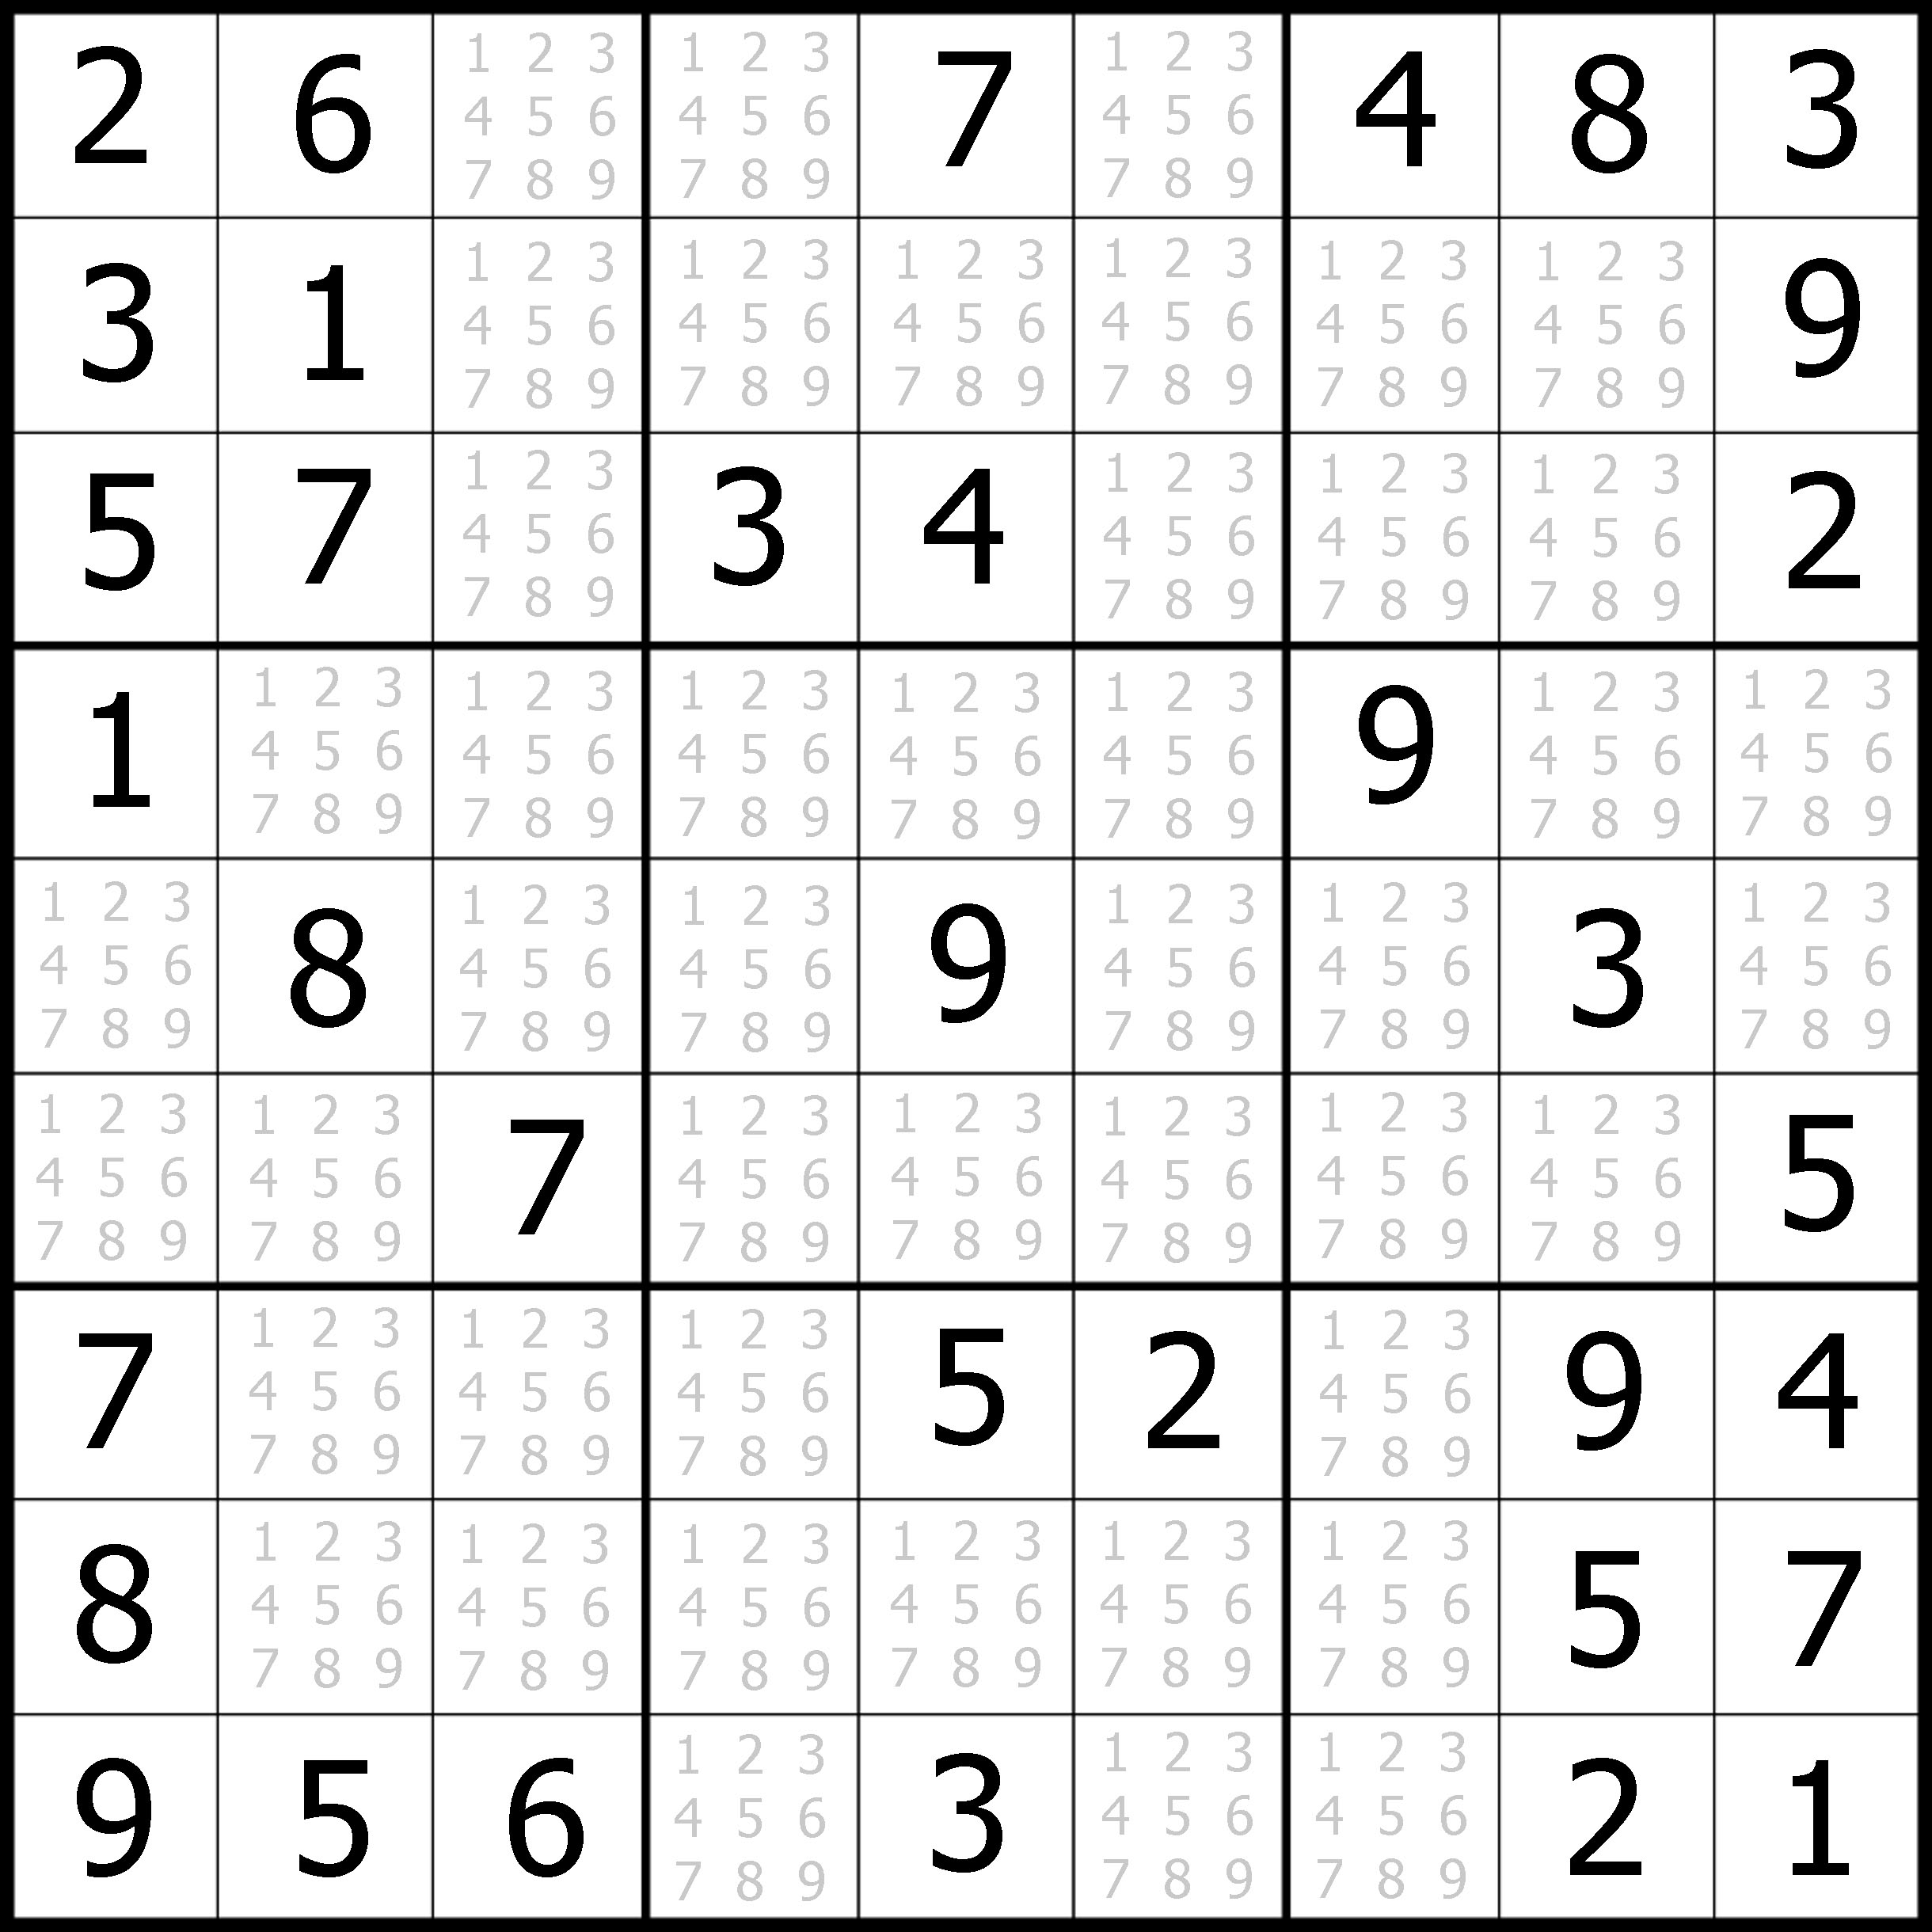 Easy Sudoku Printable | Kids Activities - Printable Sudoku Puzzle Easy